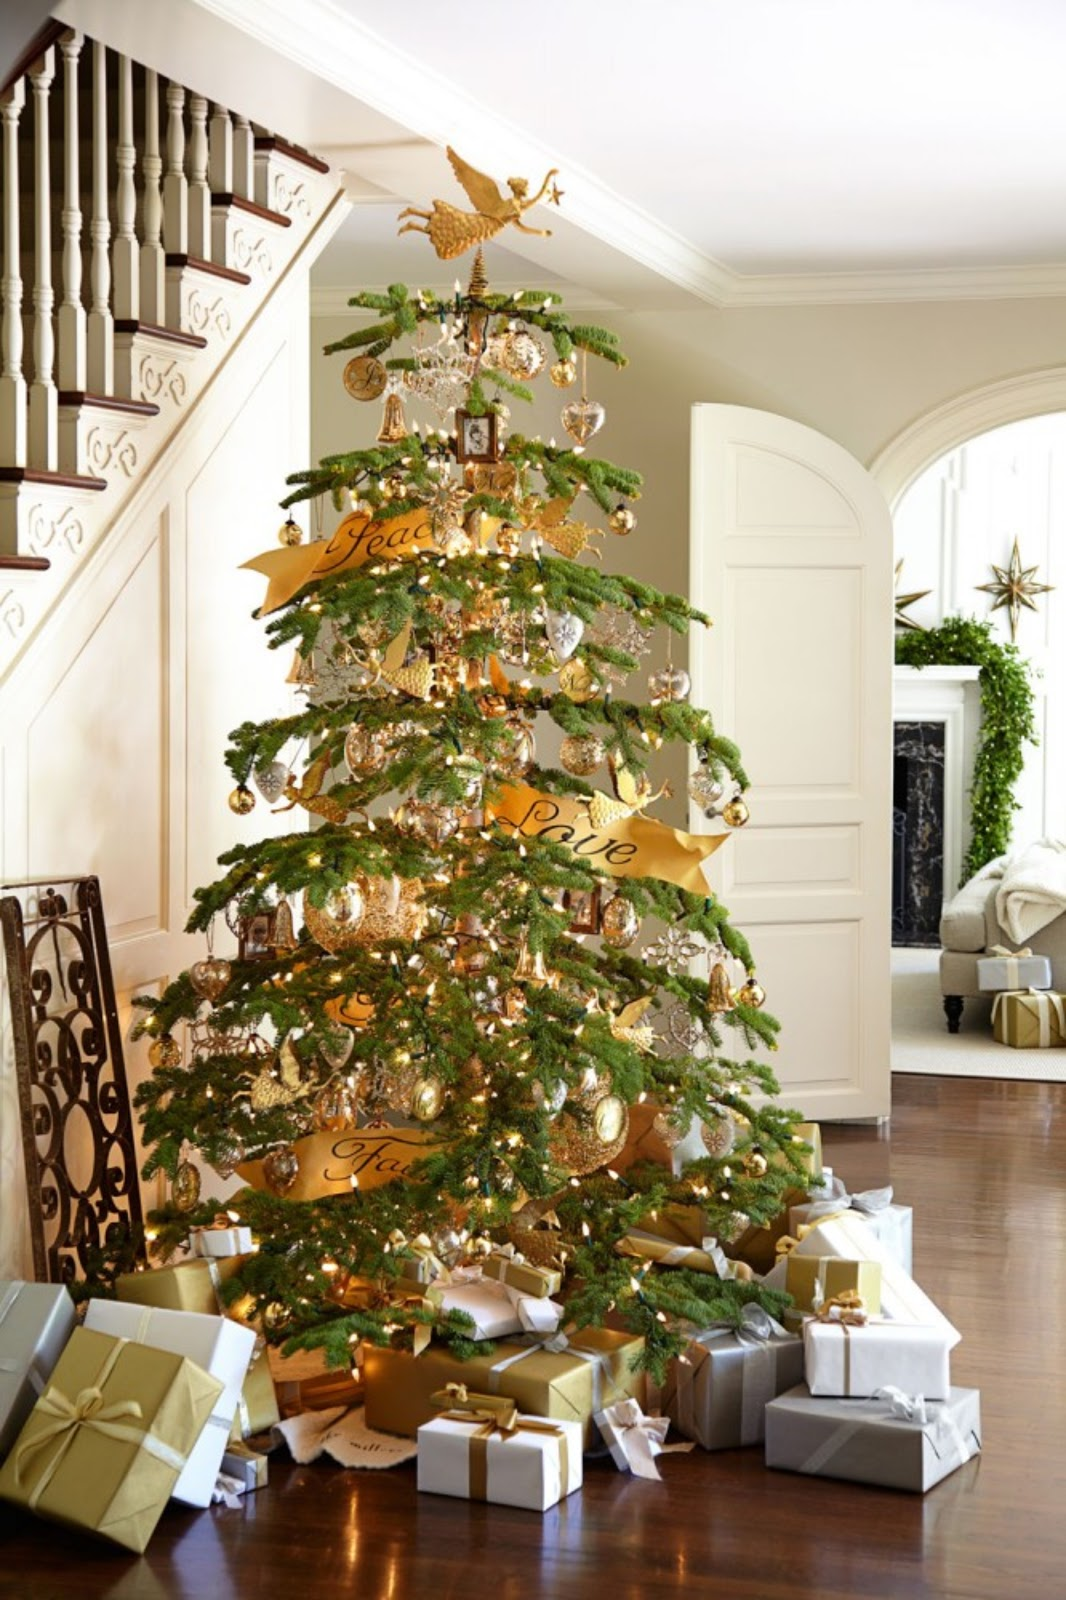 J. Thaddeus Ozark's Cookie Jars And Other Larks: Christmas